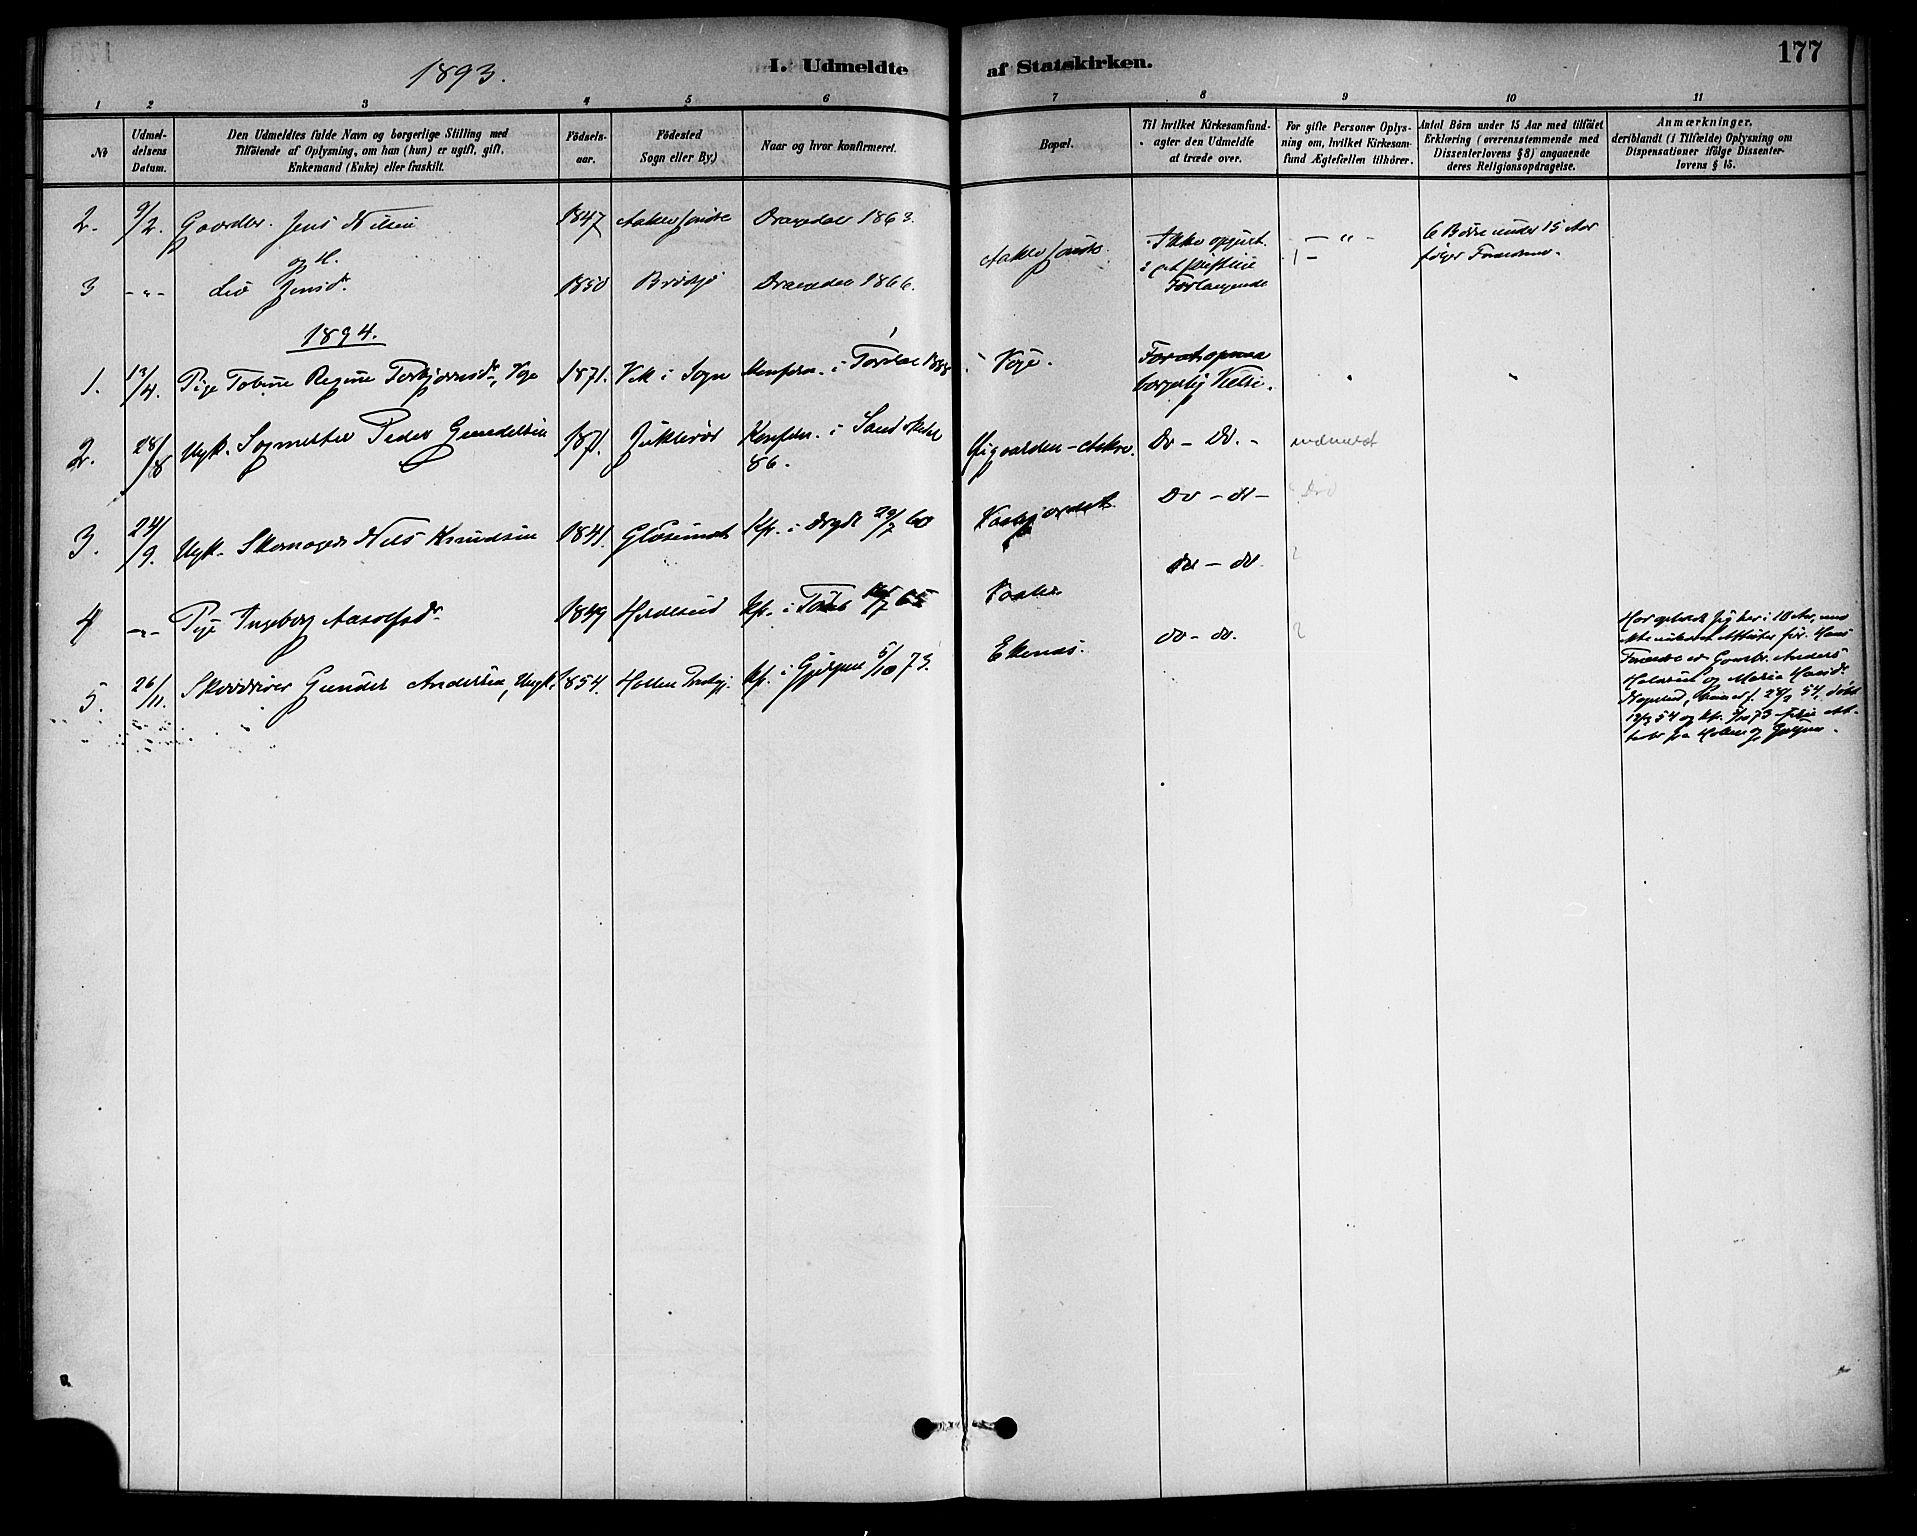 SAKO, Drangedal kirkebøker, F/Fa/L0011: Ministerialbok nr. 11 /1, 1885-1894, s. 177